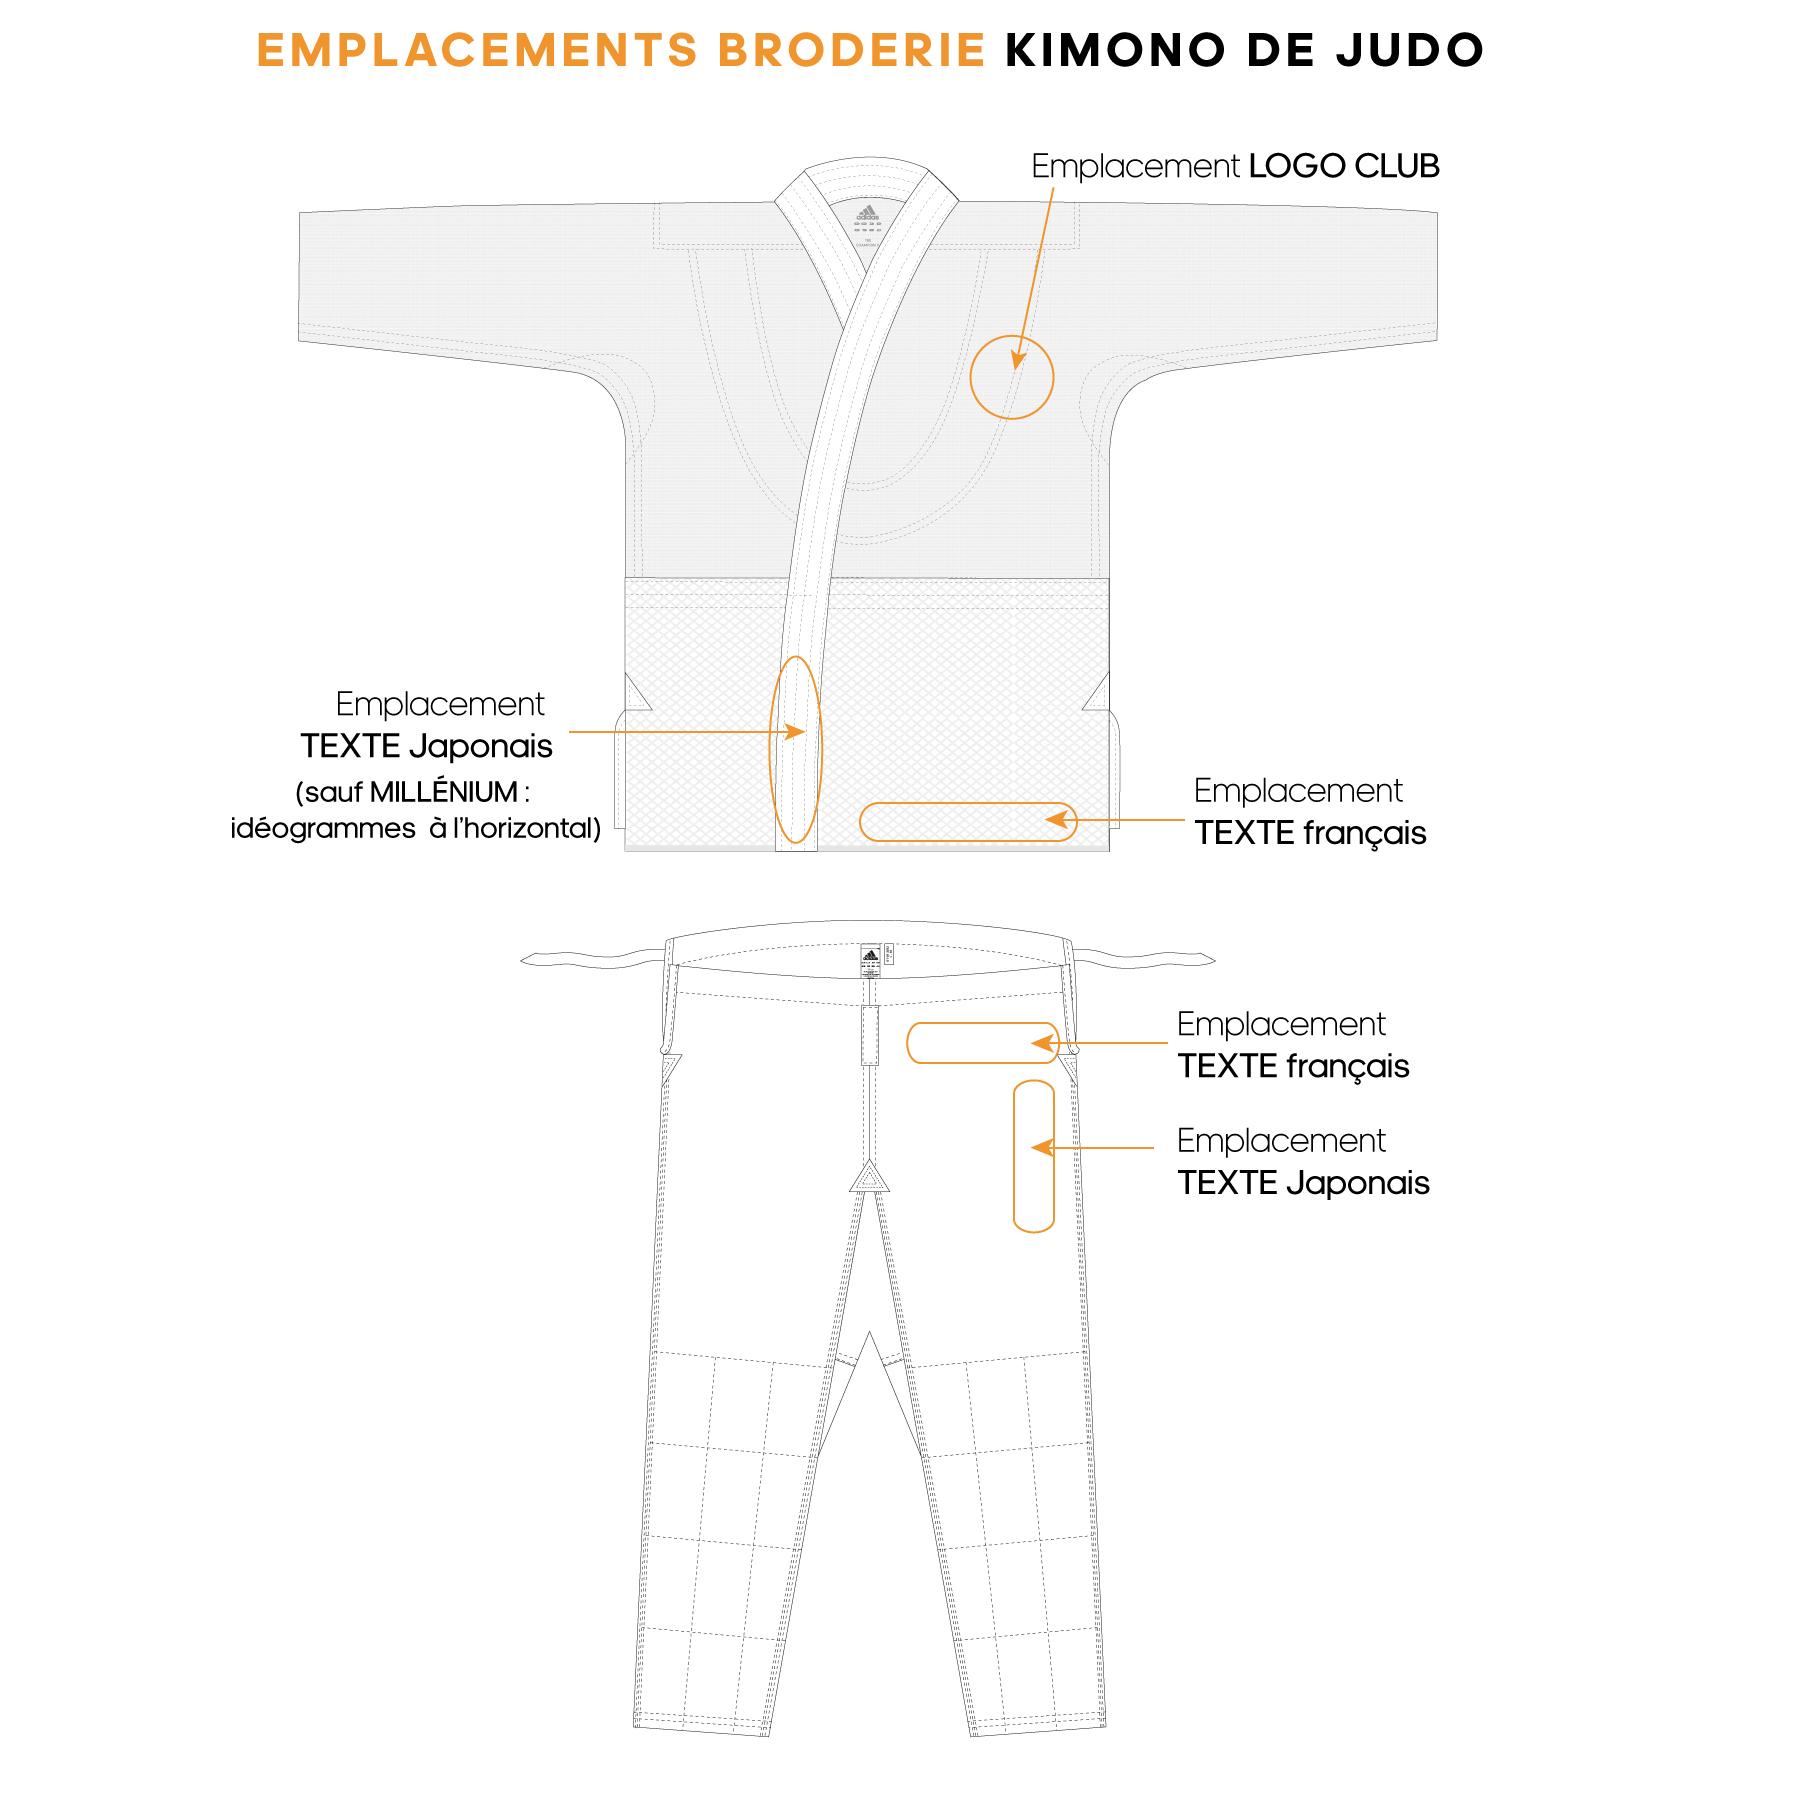 Broderie kimono de judo